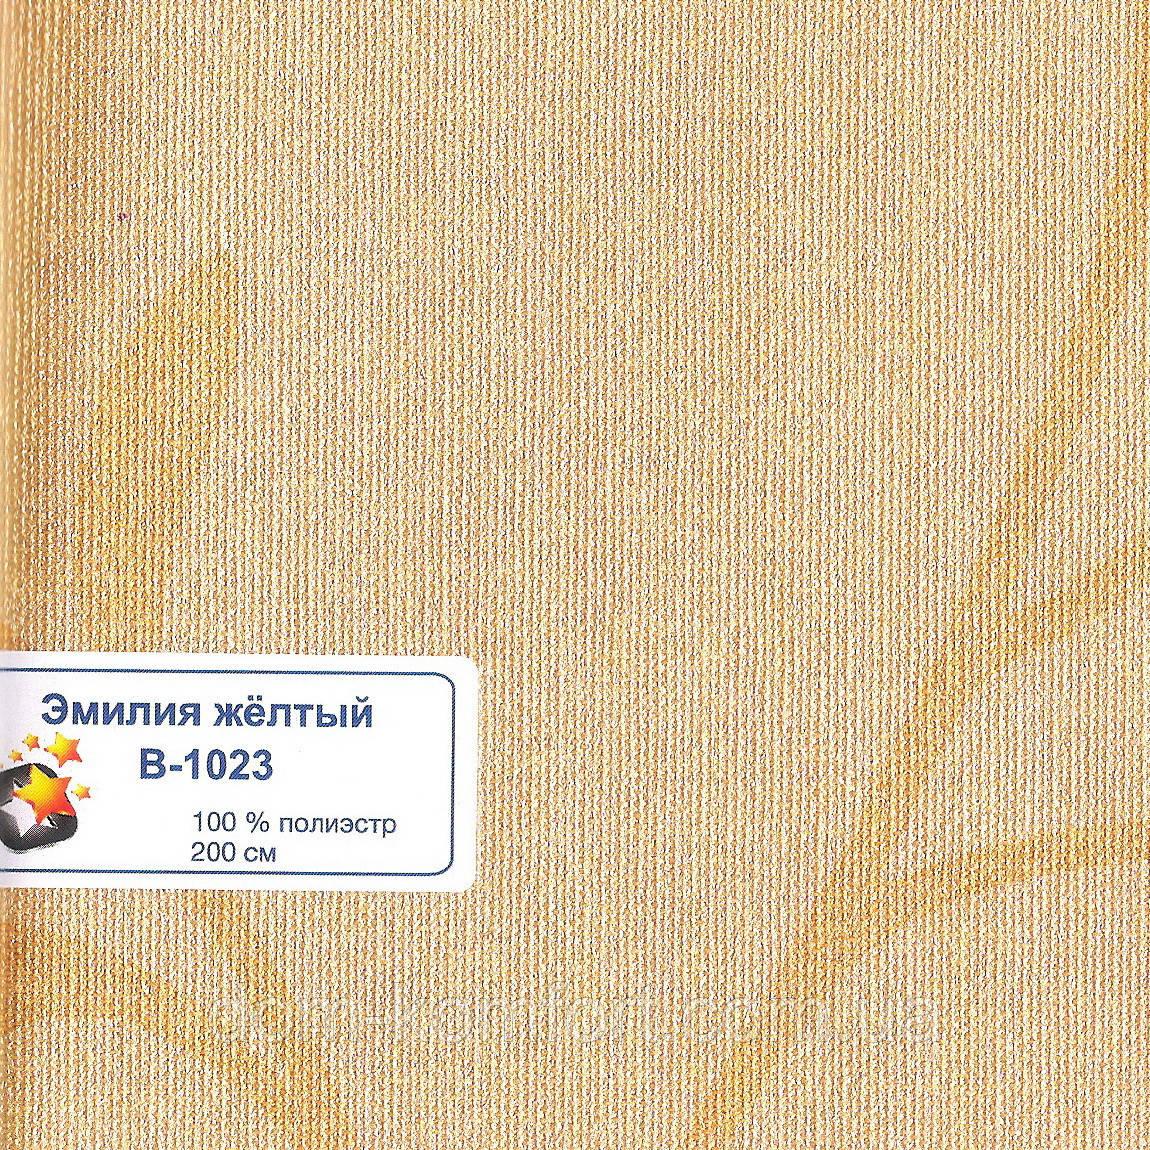 Рулонные шторы Ткань Эмилия Жёлтый